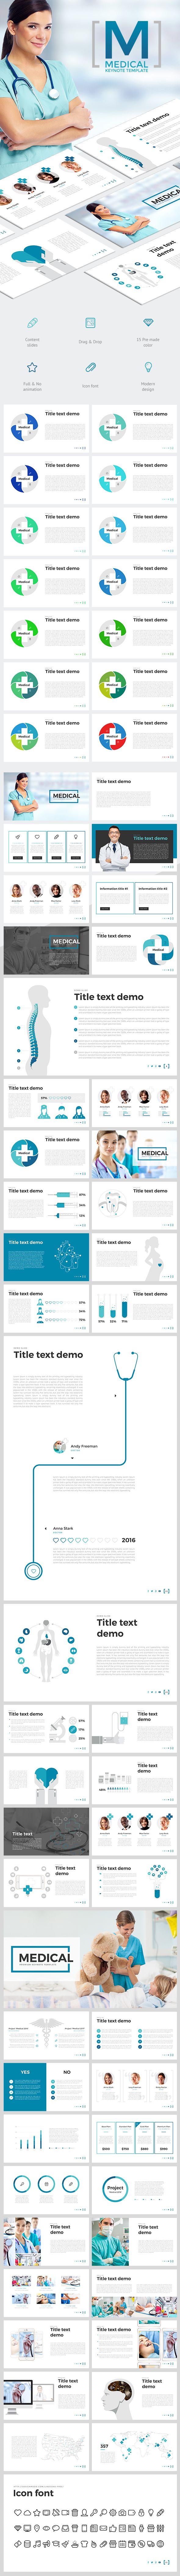 Medical Pinterest Keynote Presentation Templates And Template